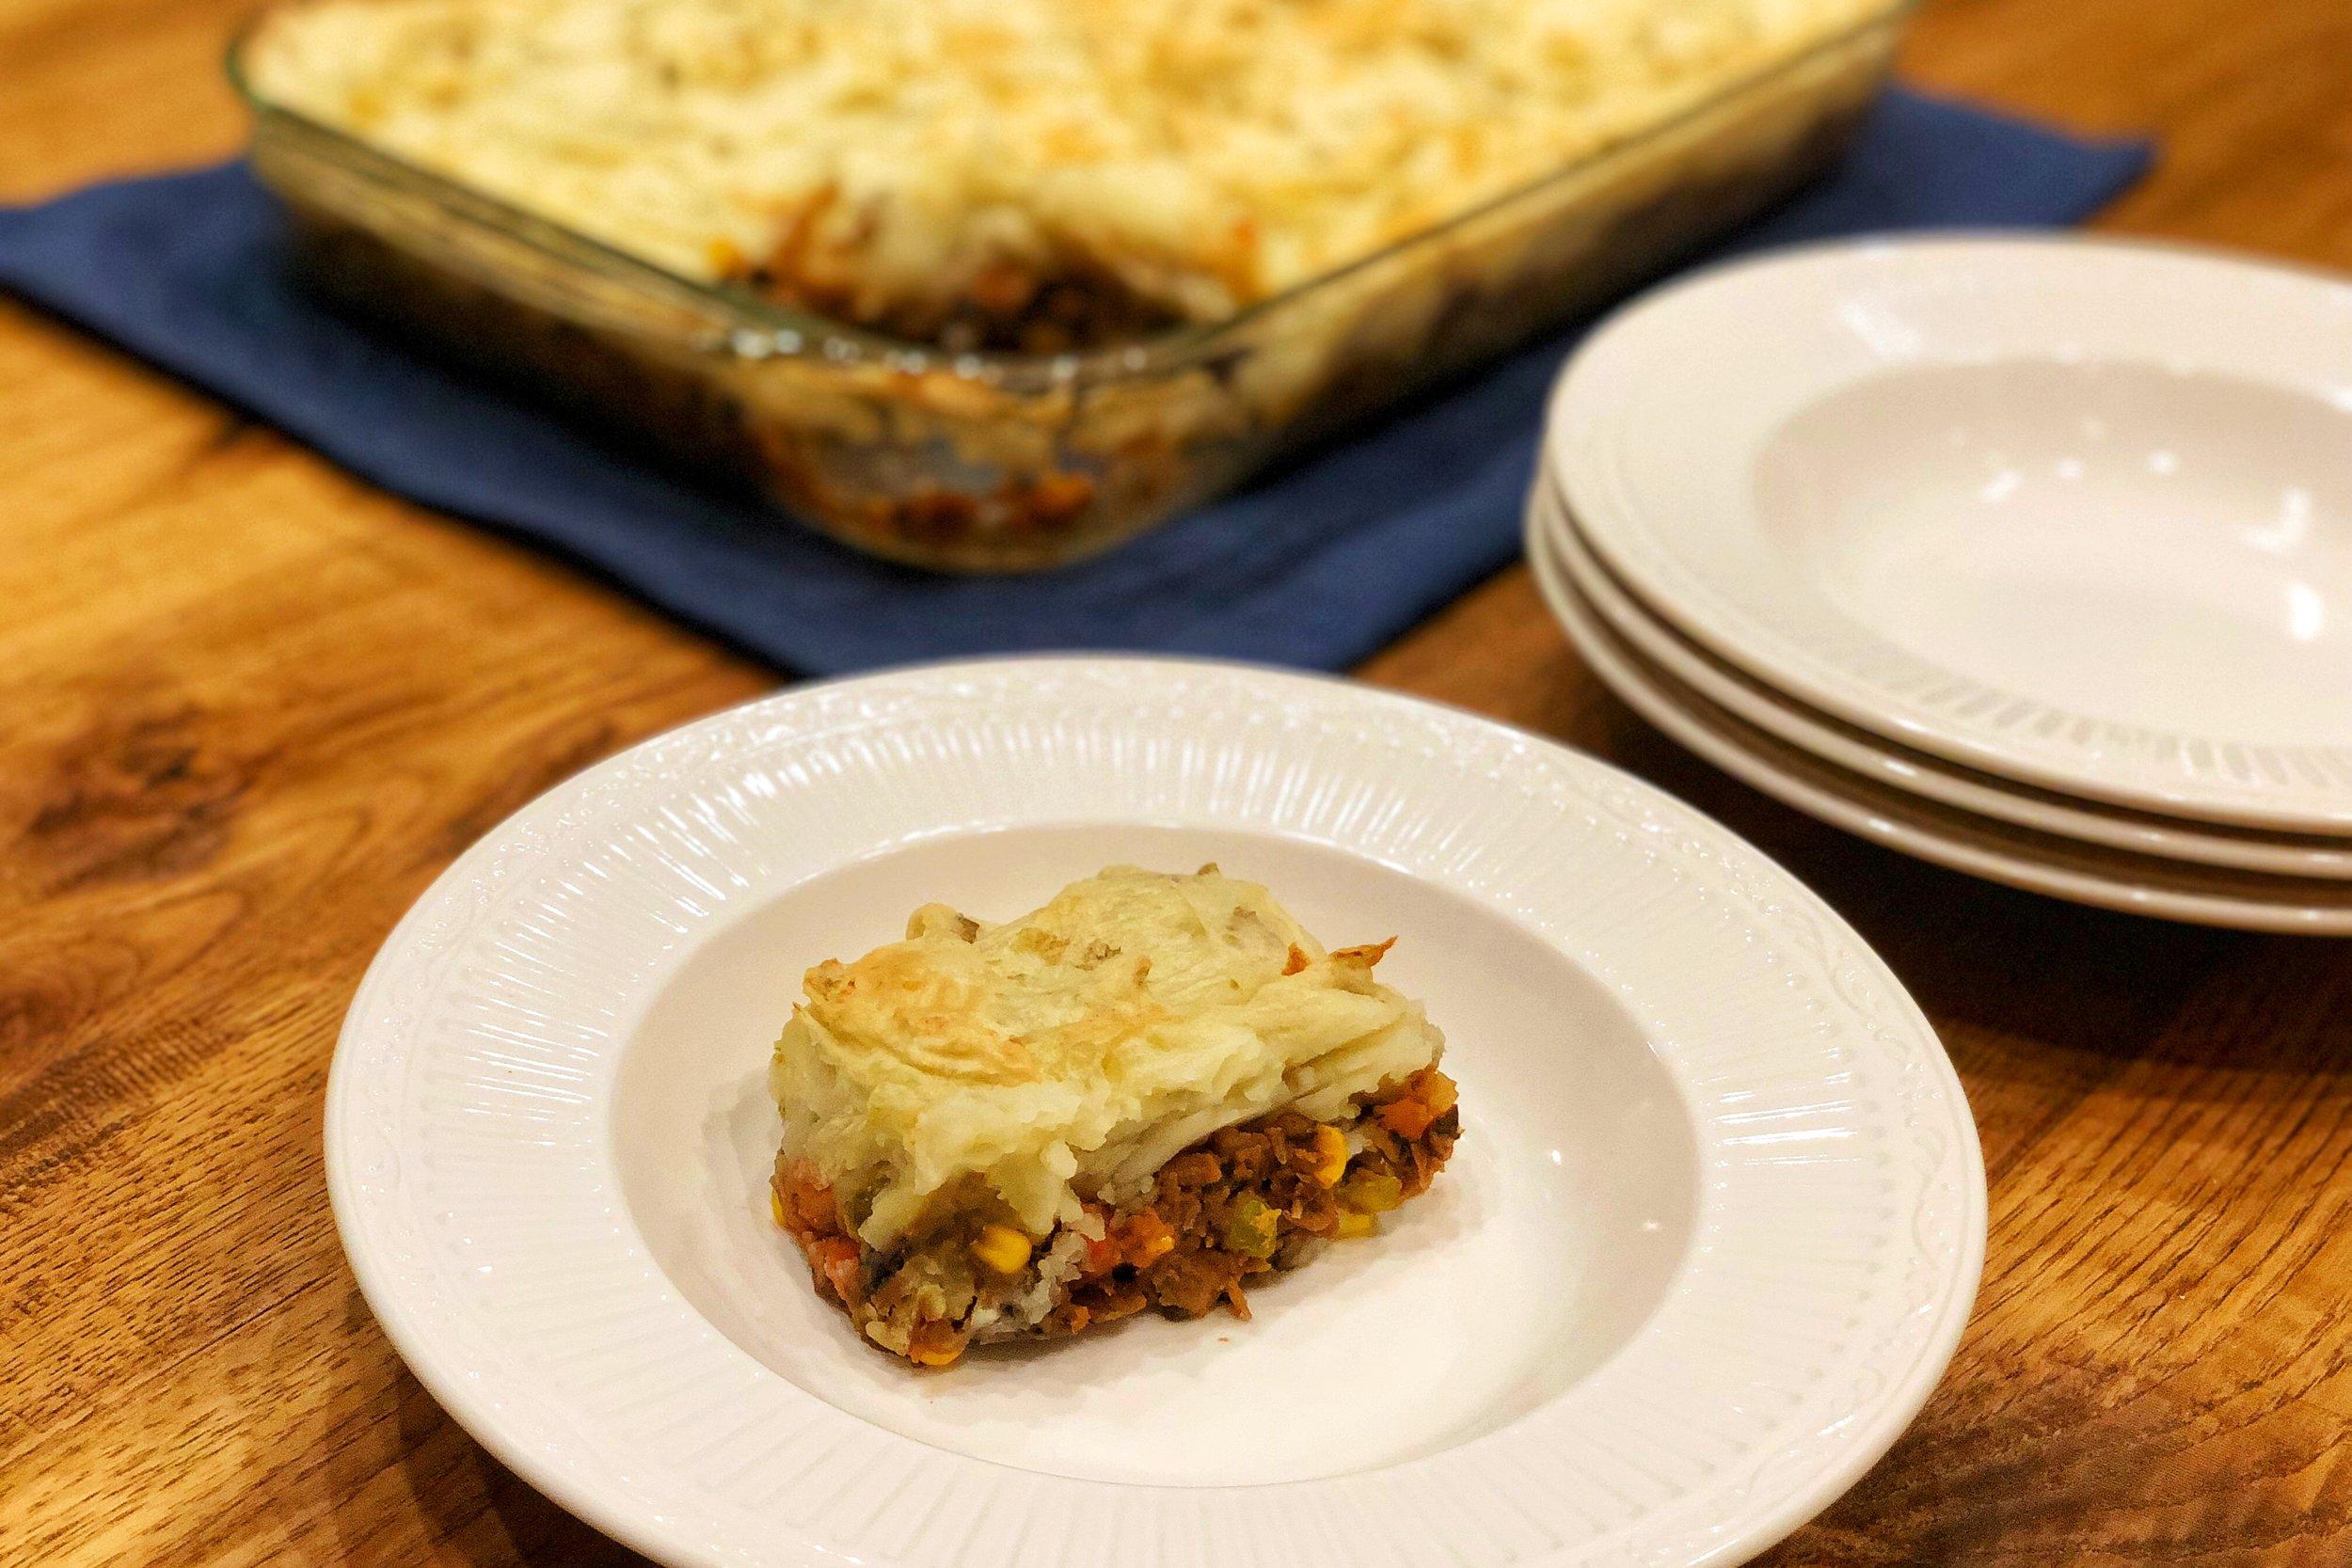 Whole-Food Plant-Based (WFPB) Shepherd's Pie